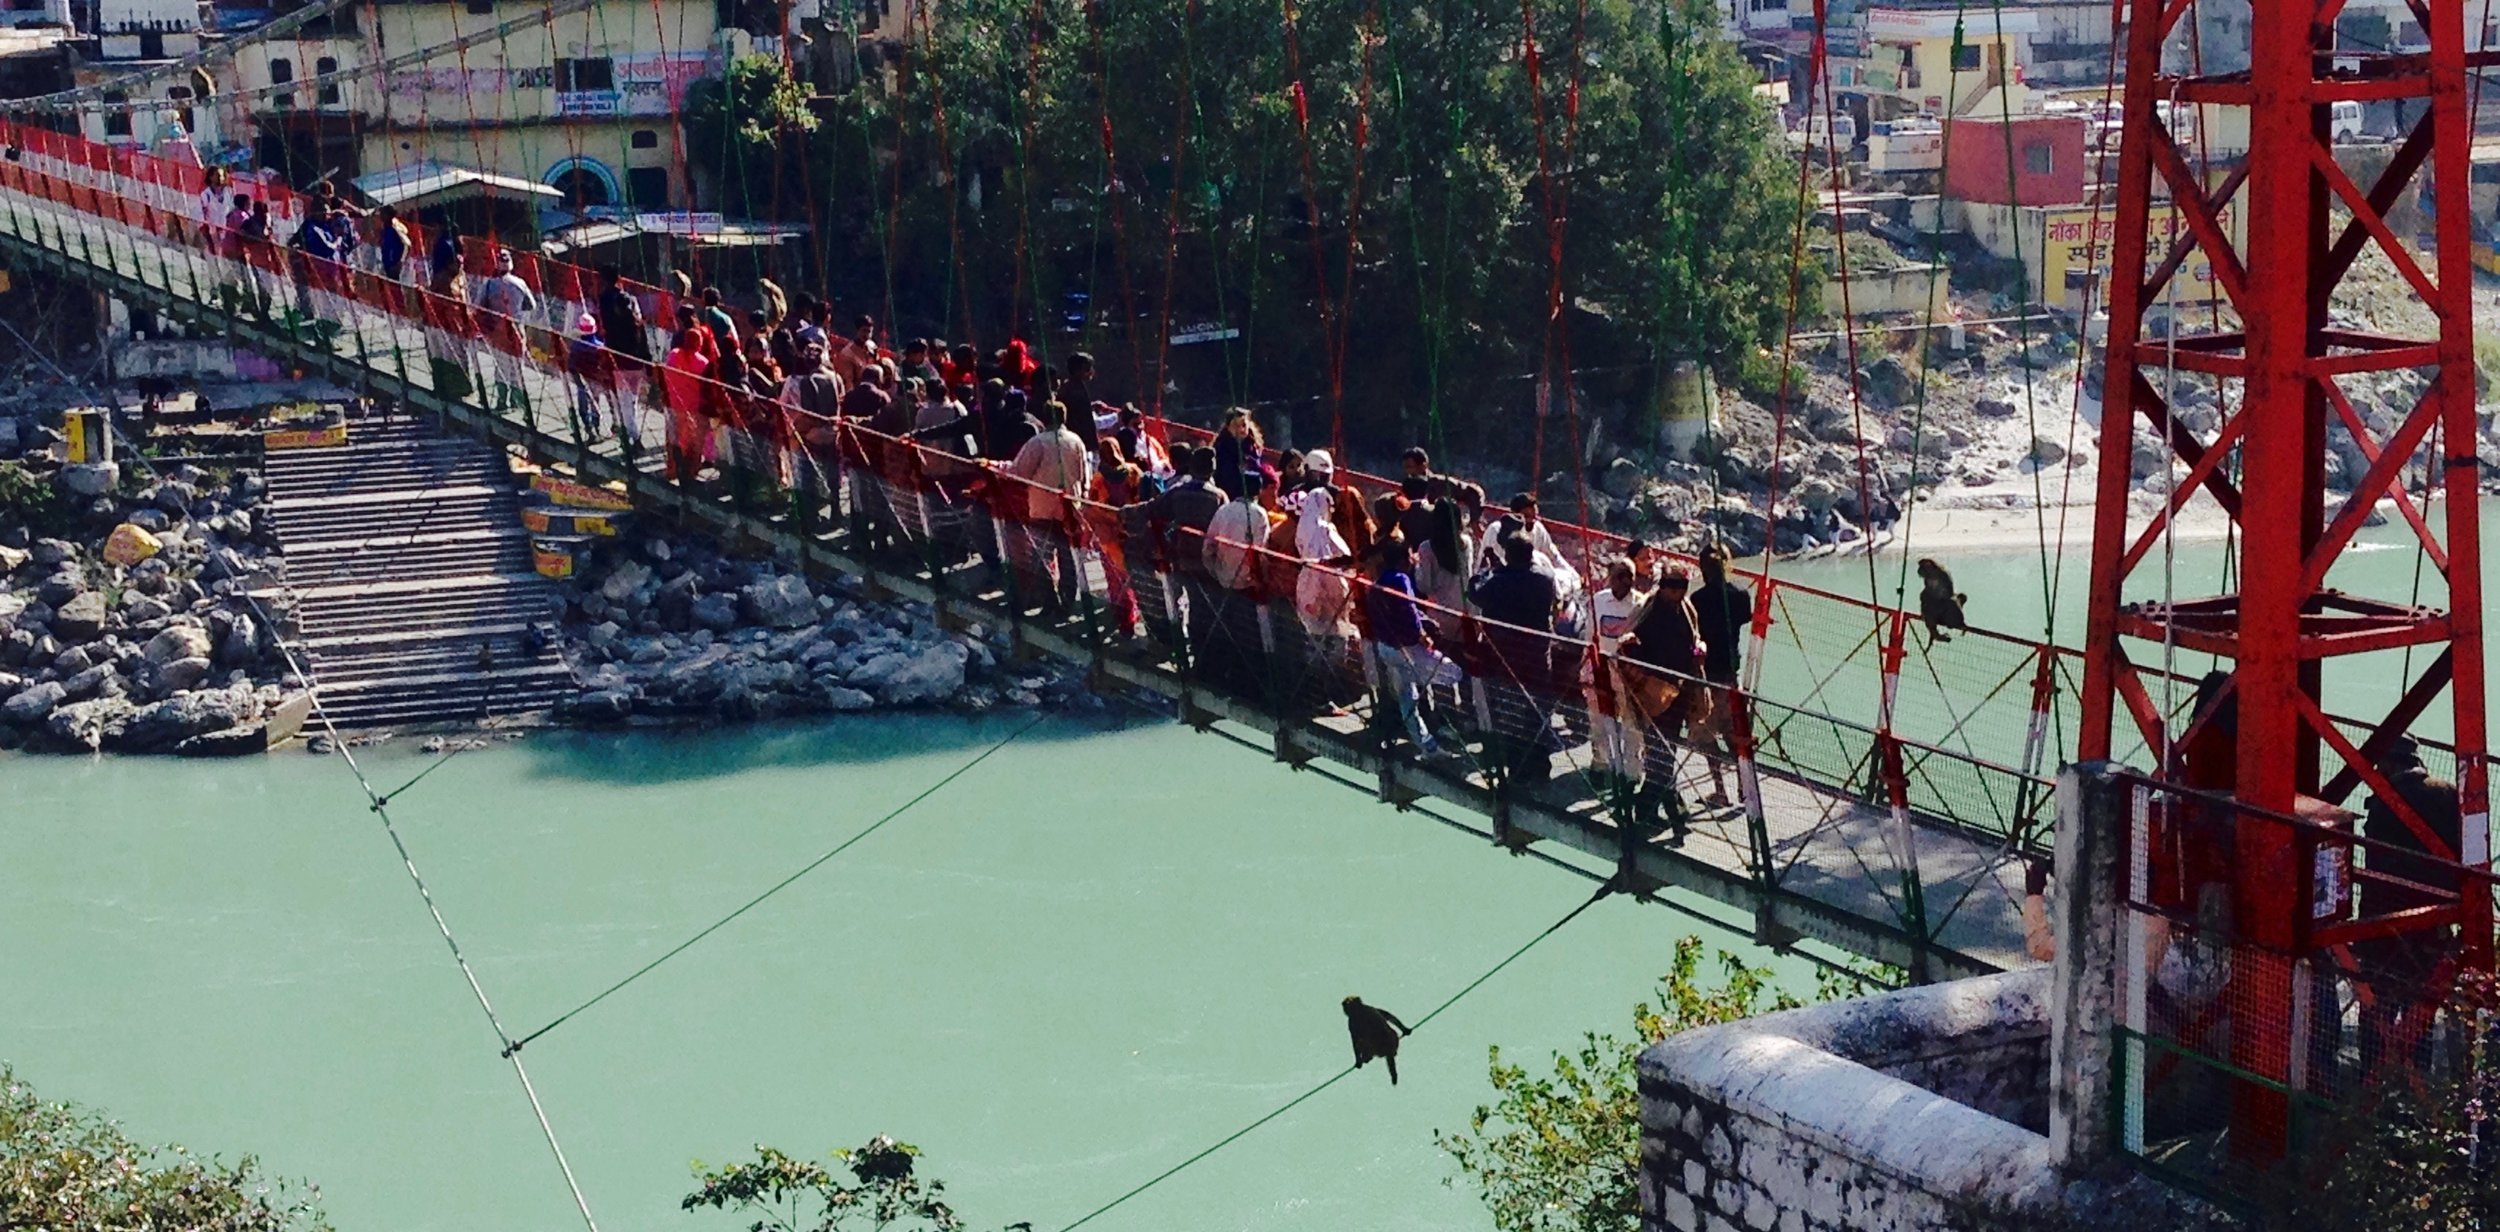 Typical Rishikesh traffic jam, monkeys included